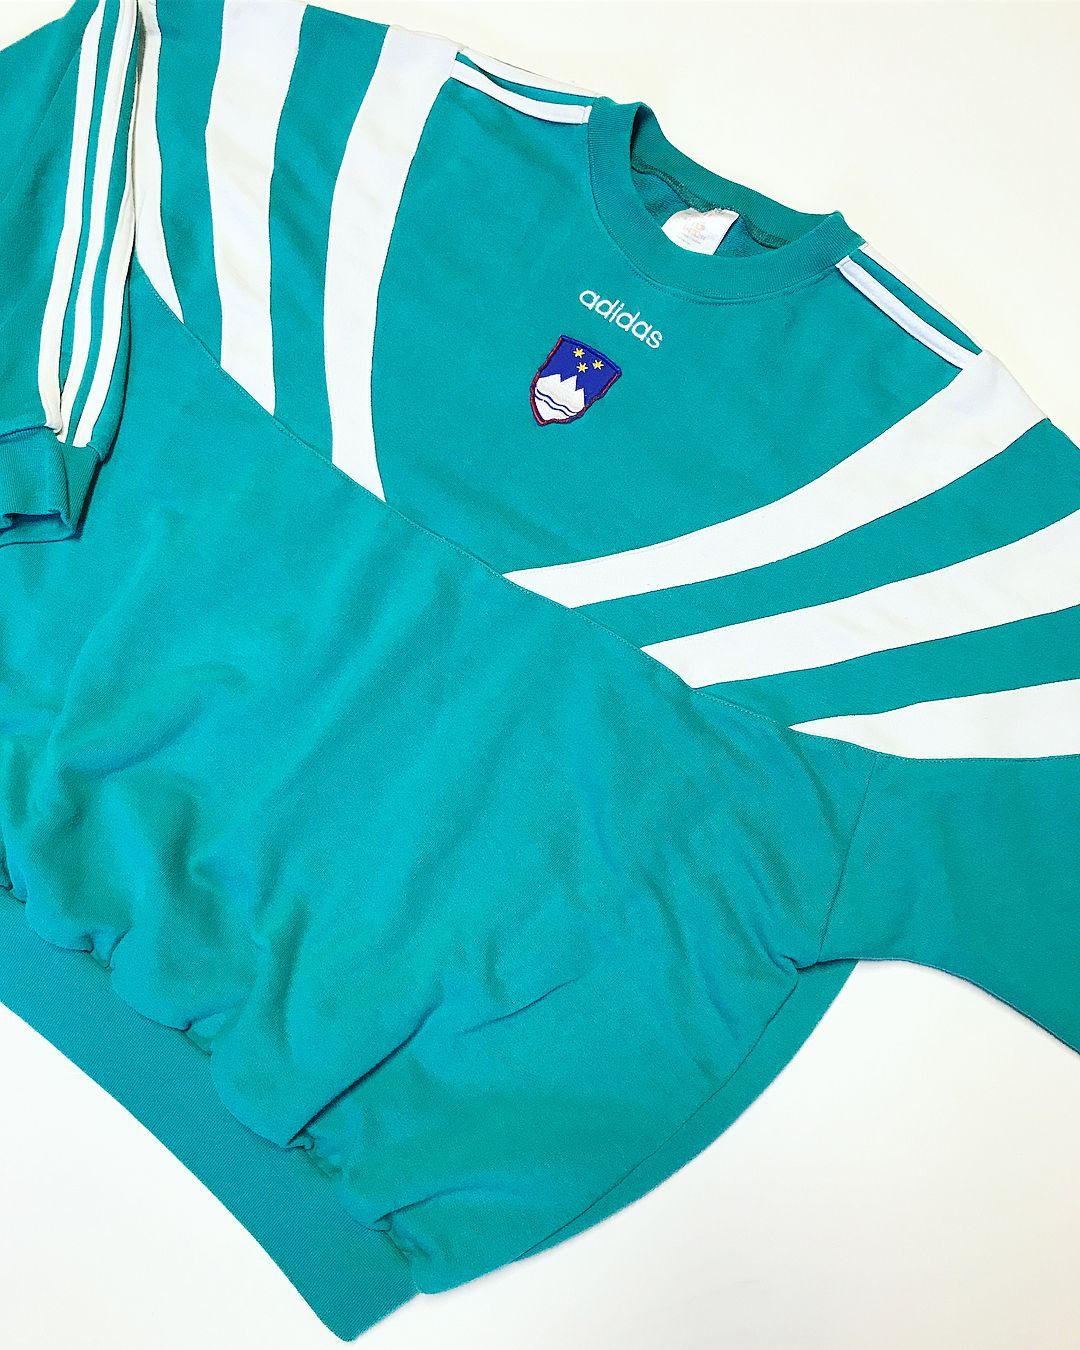 3da96708c Adidas Atlanta 1996 Slovenia olympic team crewneck 🇸🇮 Size XLOpen  tomorrow 12:00-18:30Today ➡ 18:30DM for online order#lowkey_studio #vevey